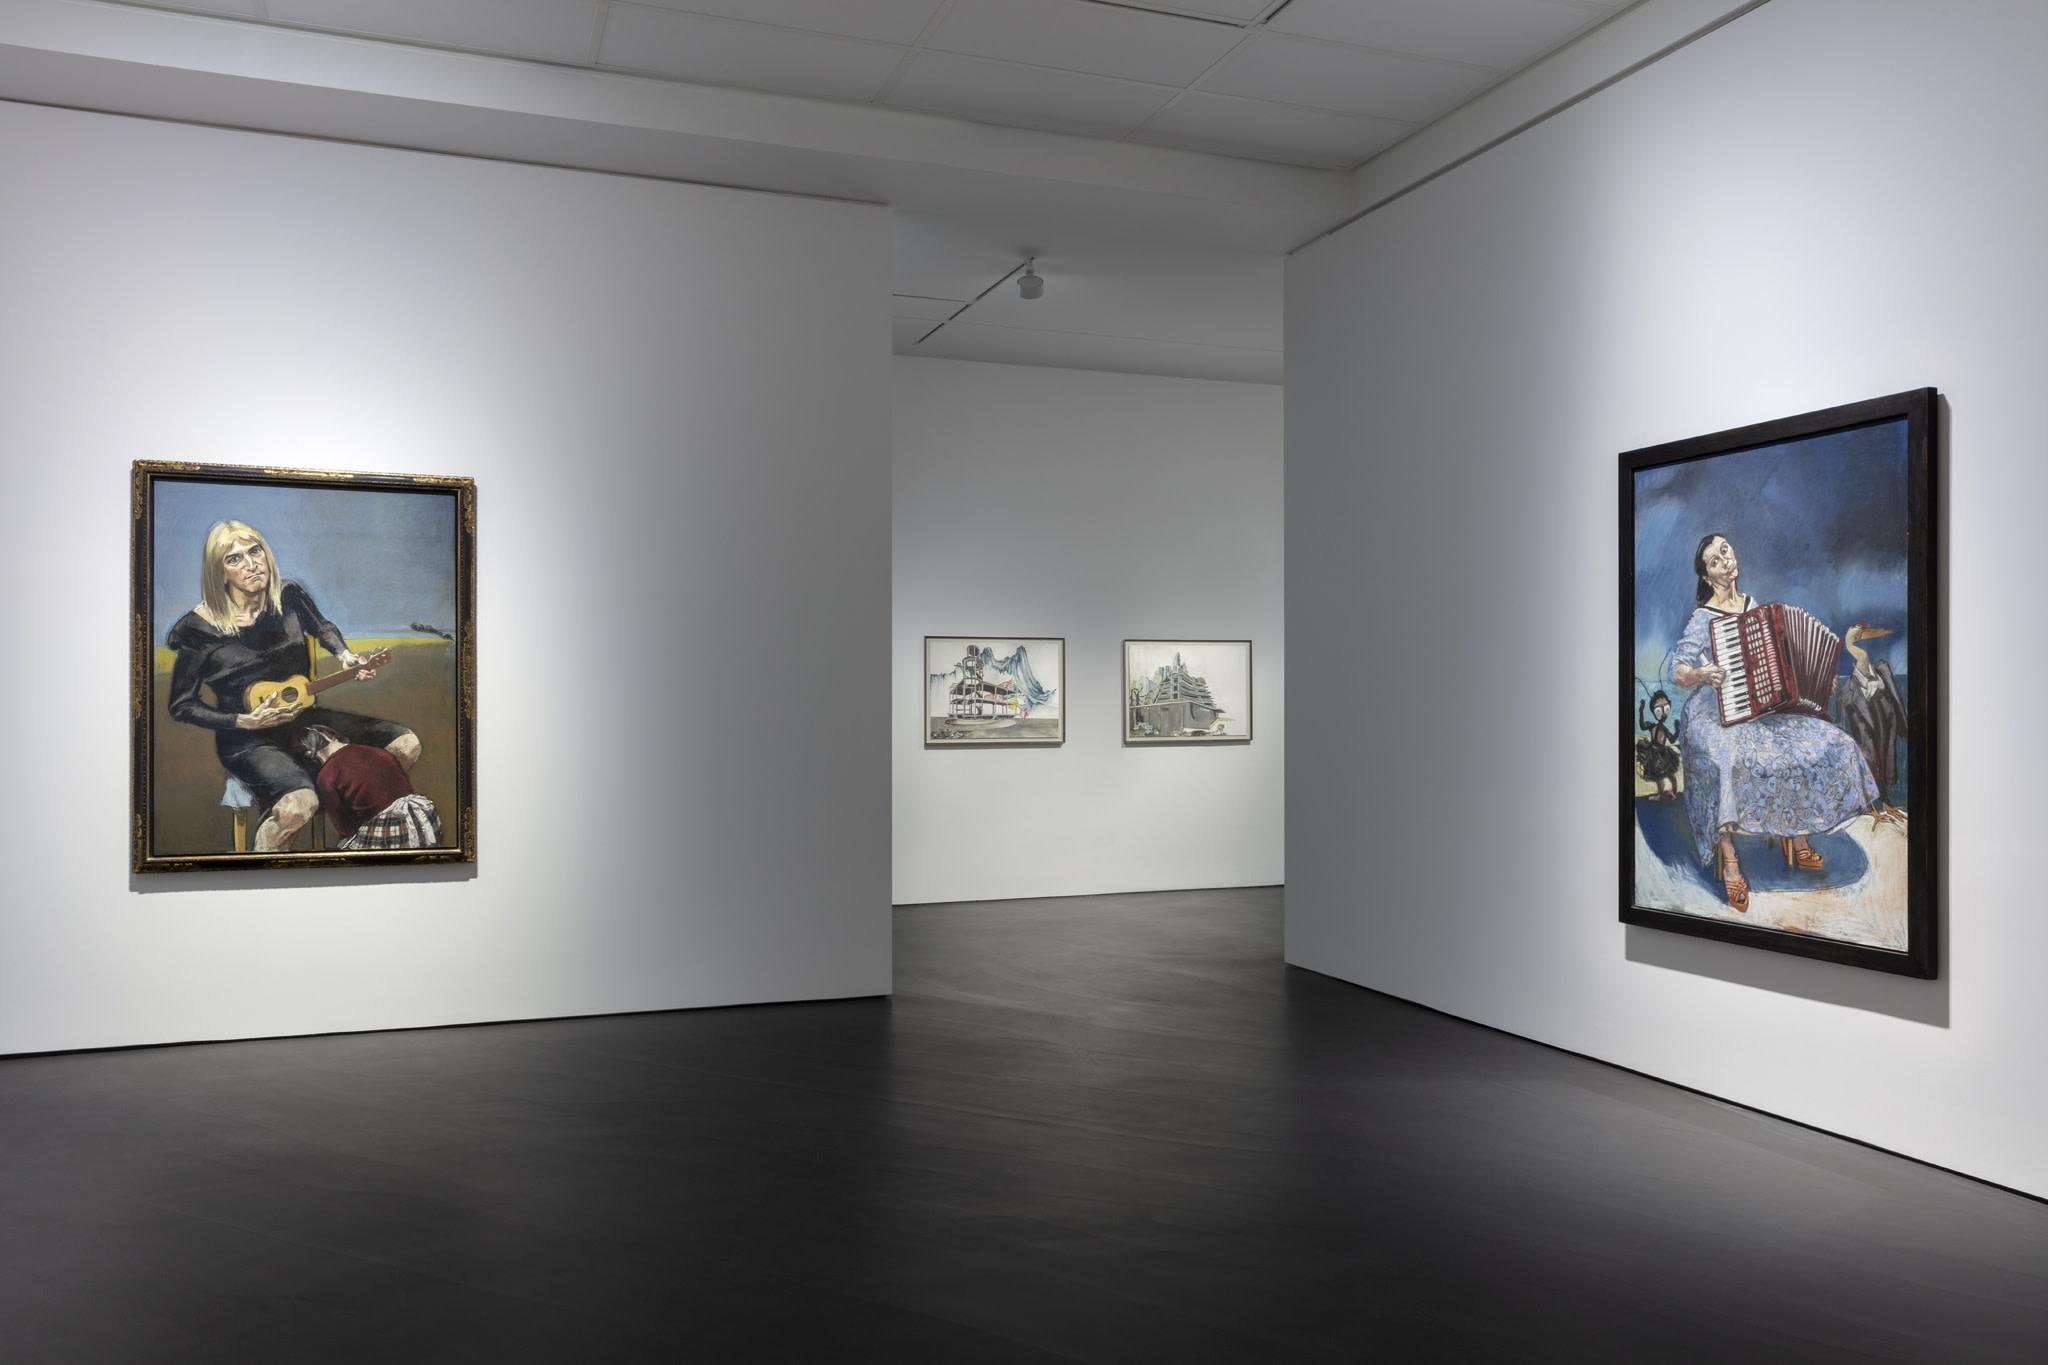 Left: Paula Rego, Olga, 2003, pastel on paper, mounted on aluminum, 160 x 120 cm (63 x 47 1/4 in); Right: Paula Rego, La Fête, 2003, pastel on paper mounted on aluminum, 170 x 120 cm (66 7/8 x 47 1/4 in). Photo © Andrea Rossetti